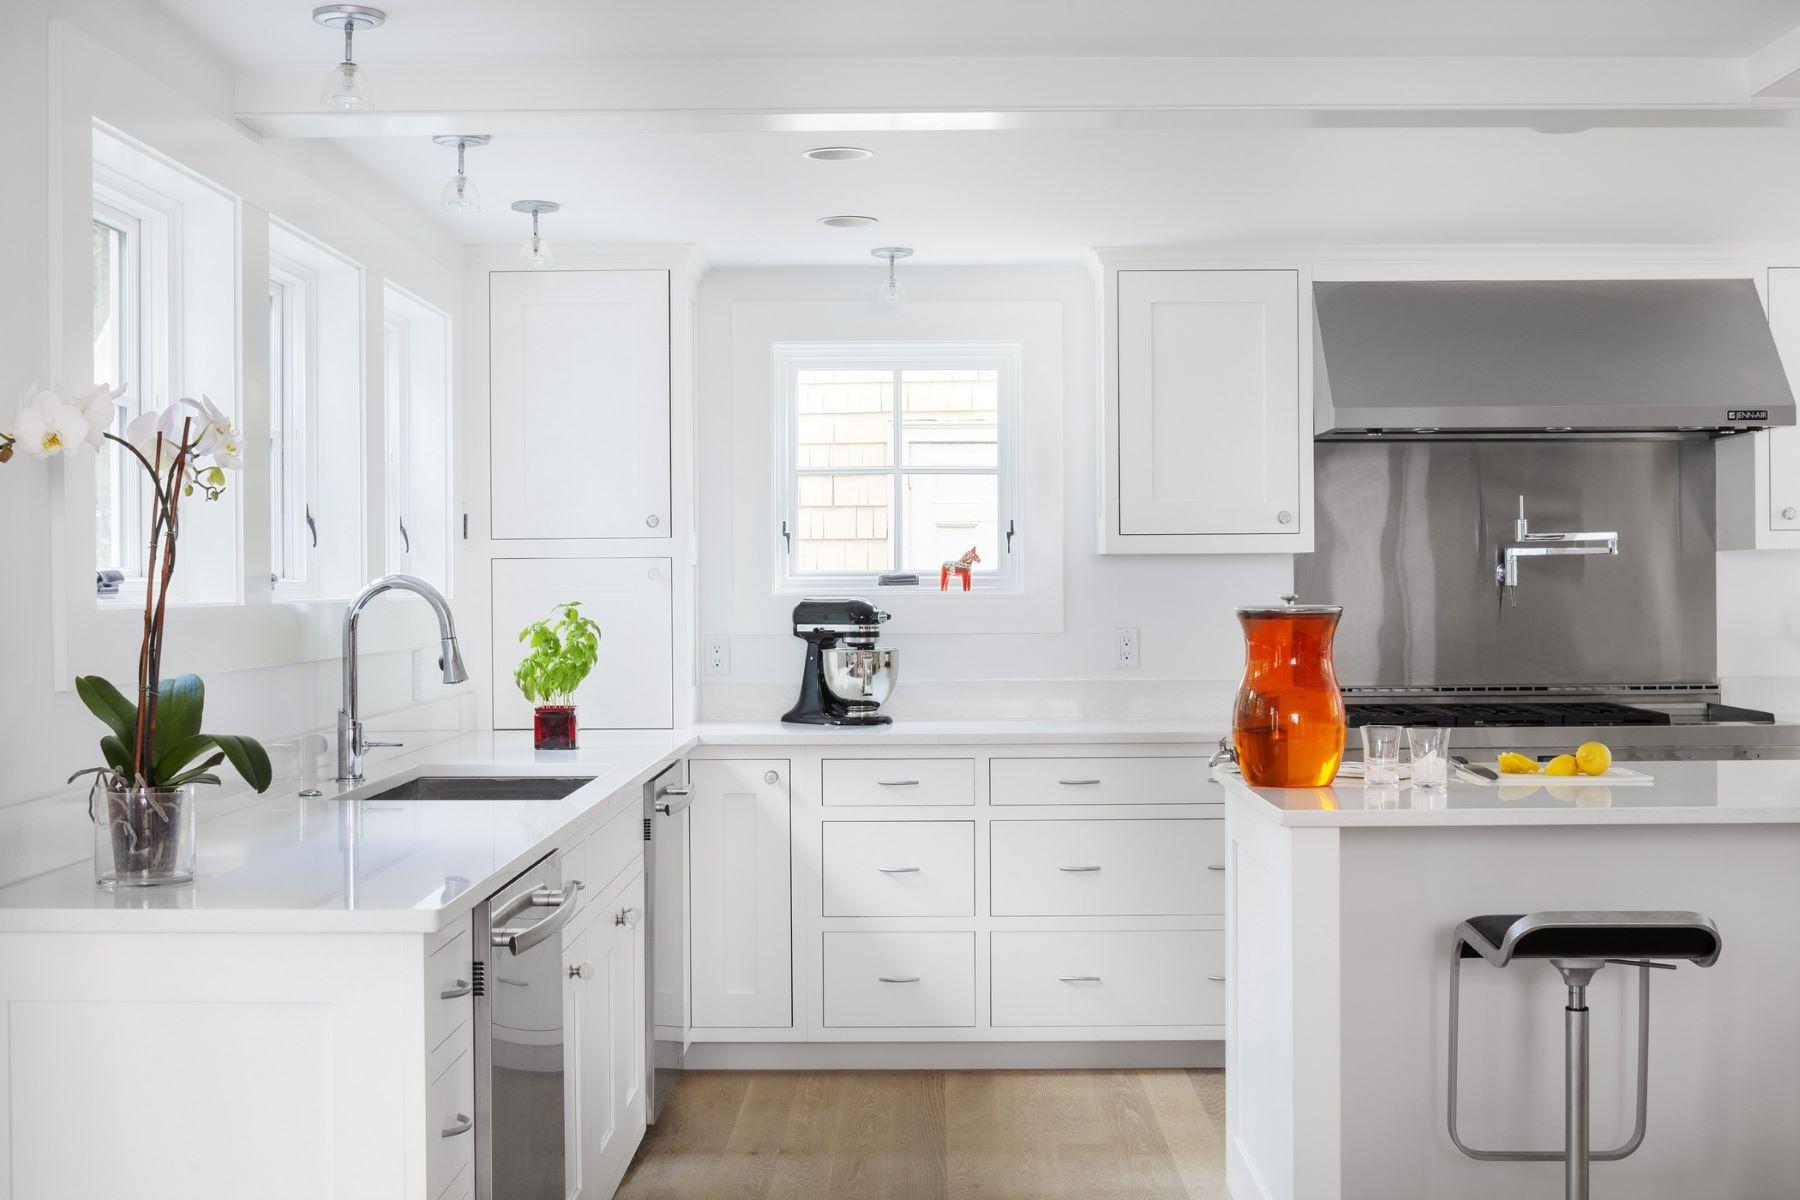 Vivienda unifamiliar por un Venta en Stunning Scandinavian Design Home 881 Massachusetts Ave Lexington, Massachusetts, 02420 Estados Unidos